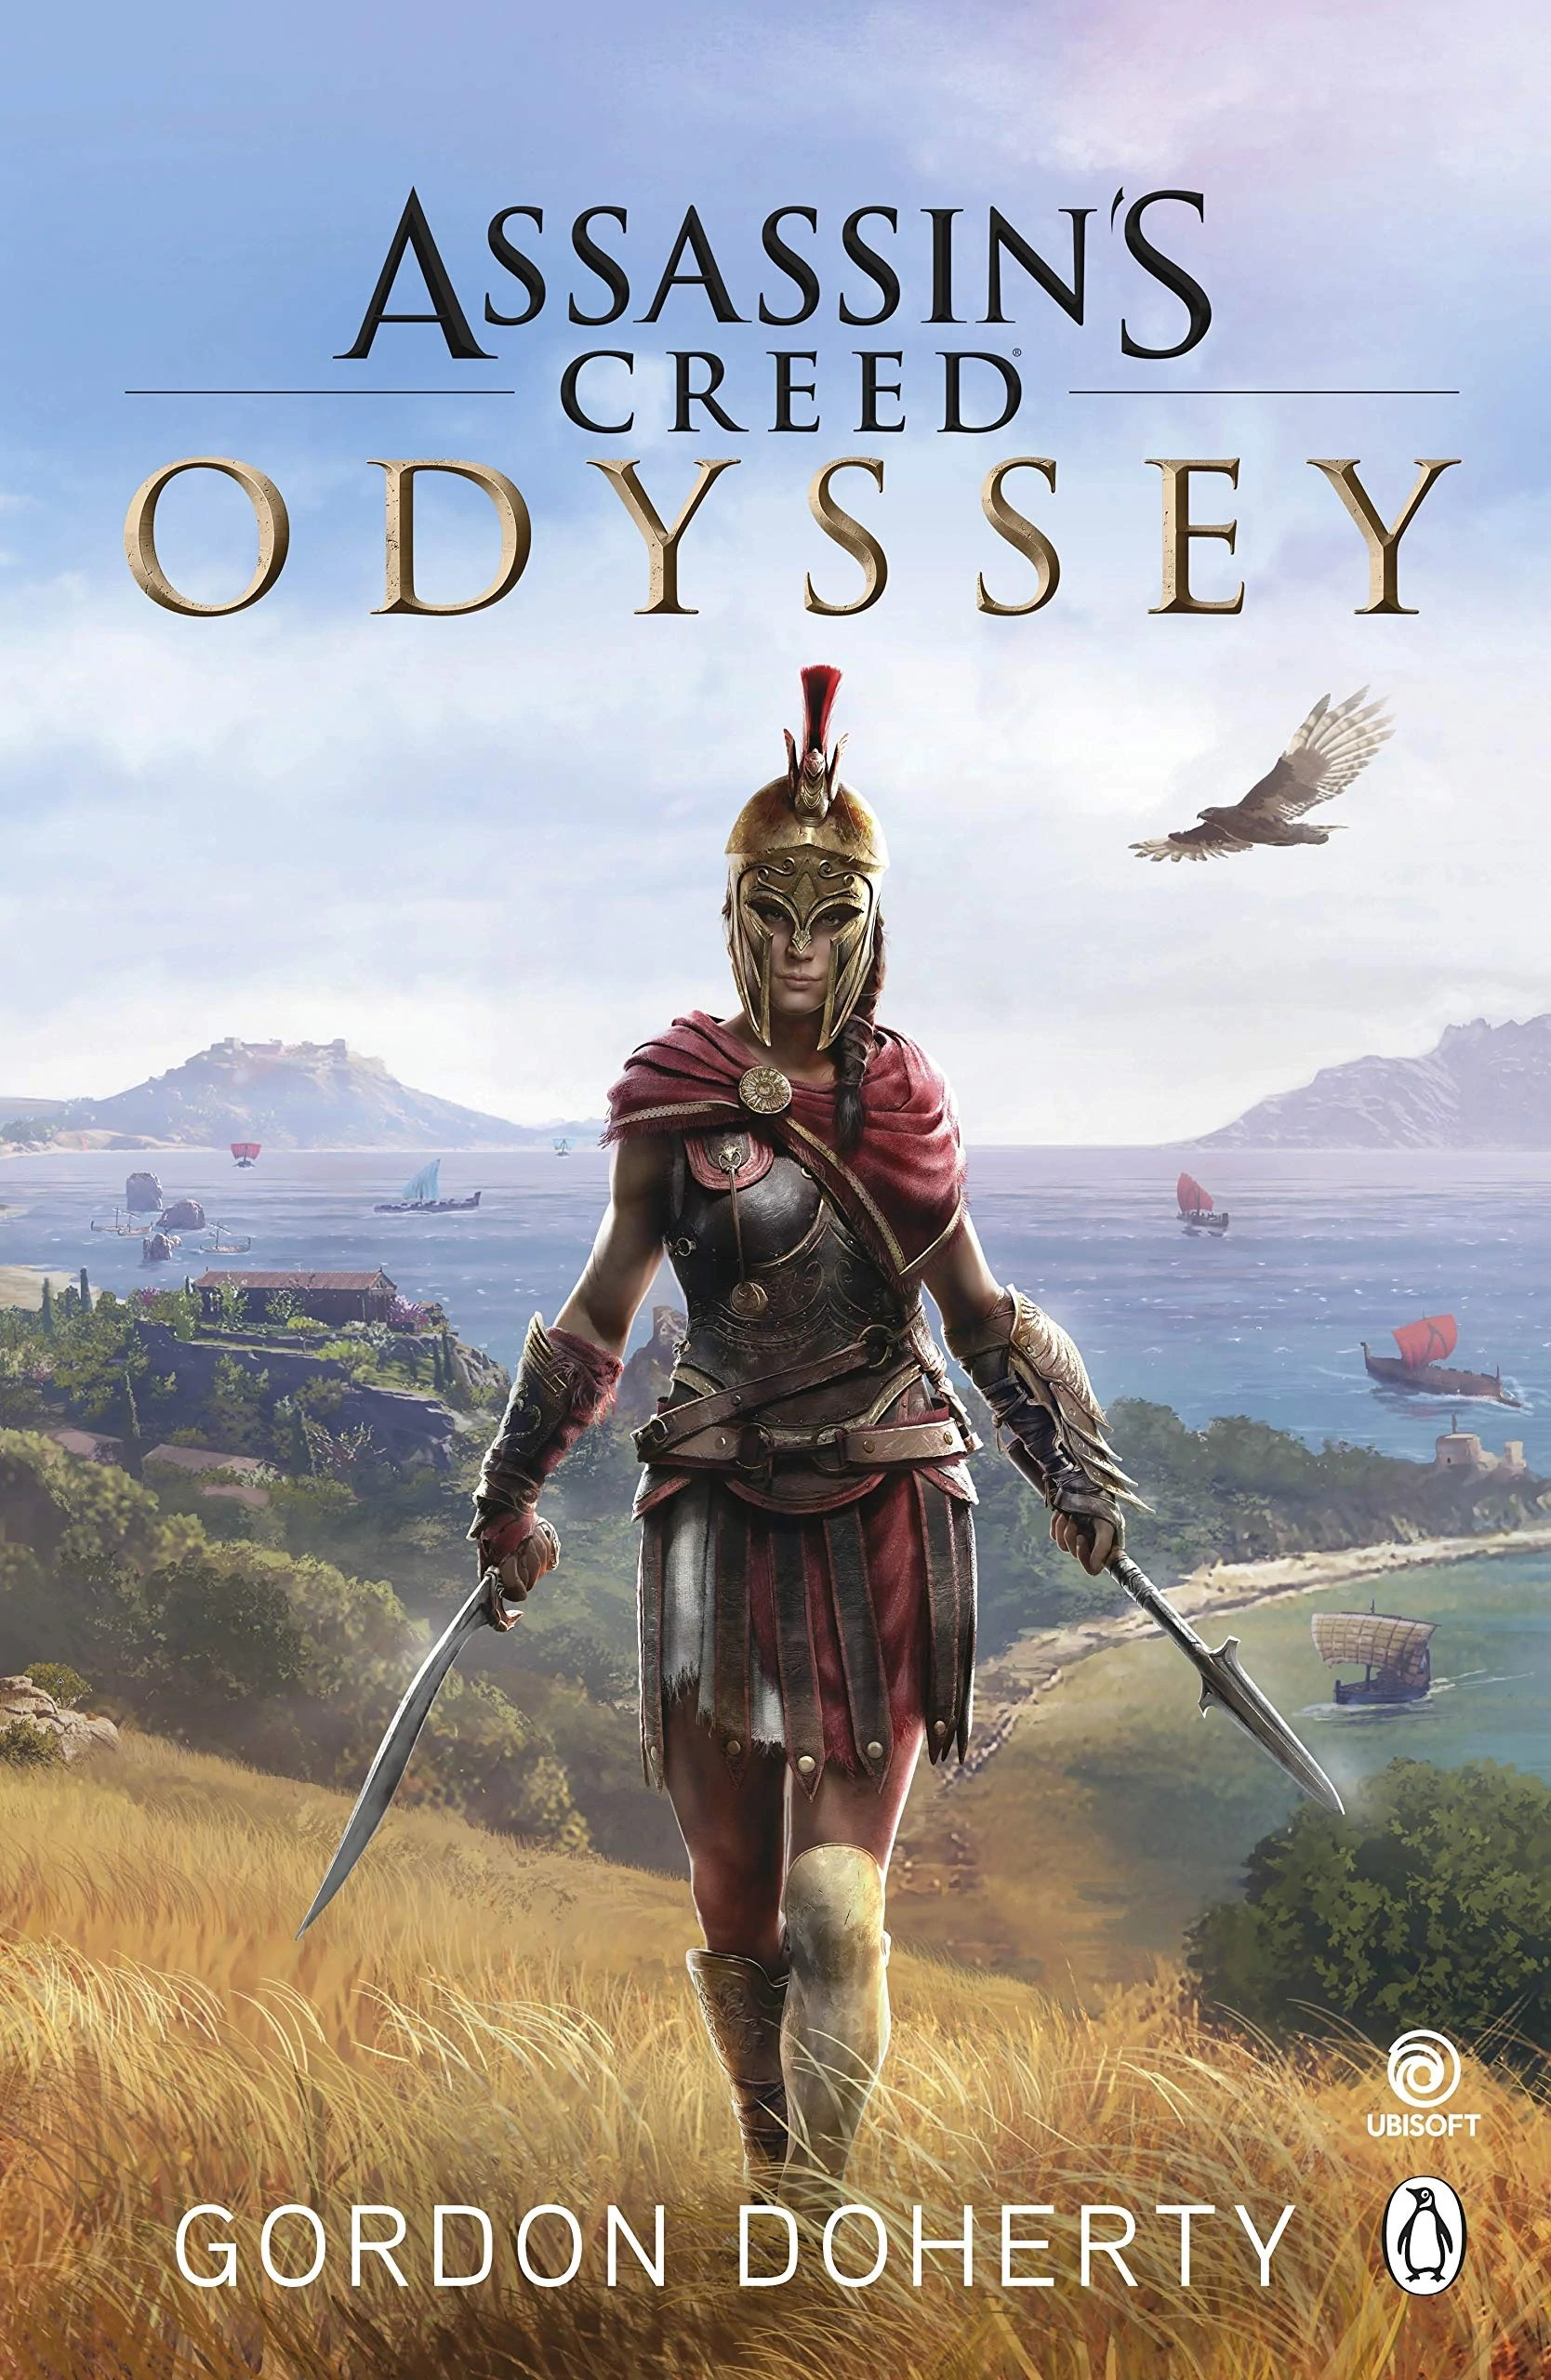 Assassins Creed Odyssey novel Assassins Creed Wiki